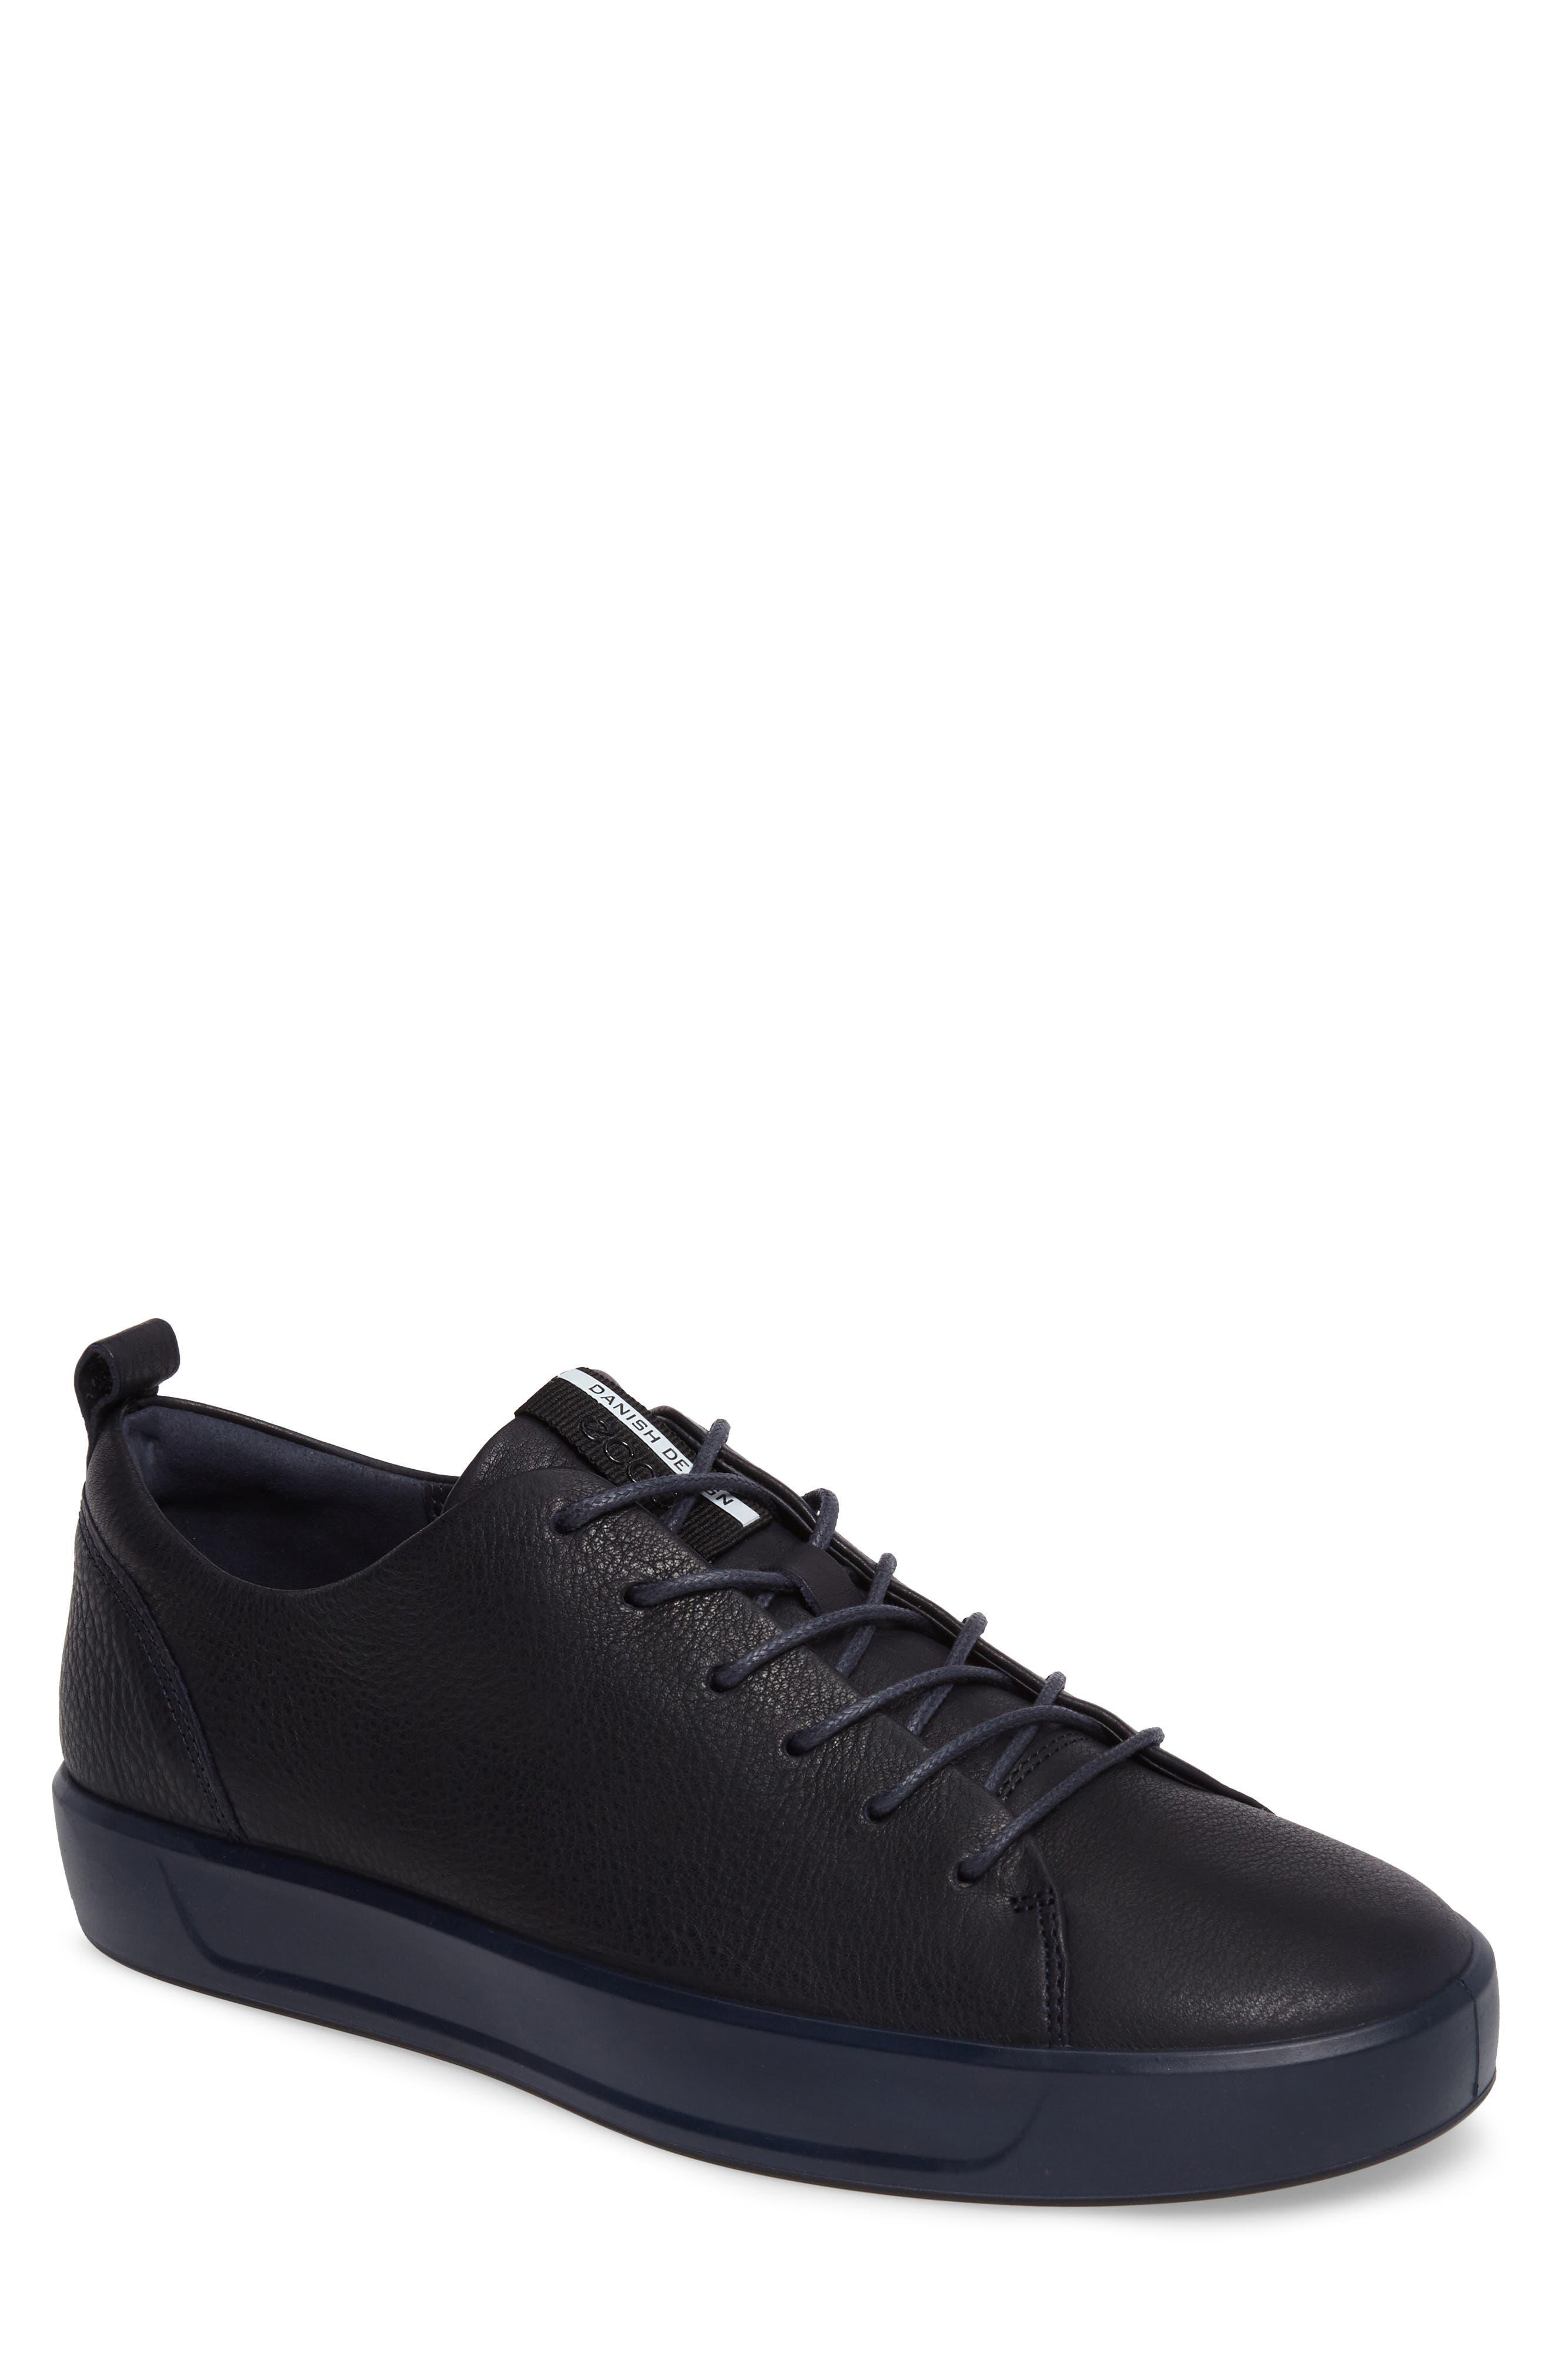 Alternate Image 1 Selected - ECCO Soft 8 Sneaker (Men)